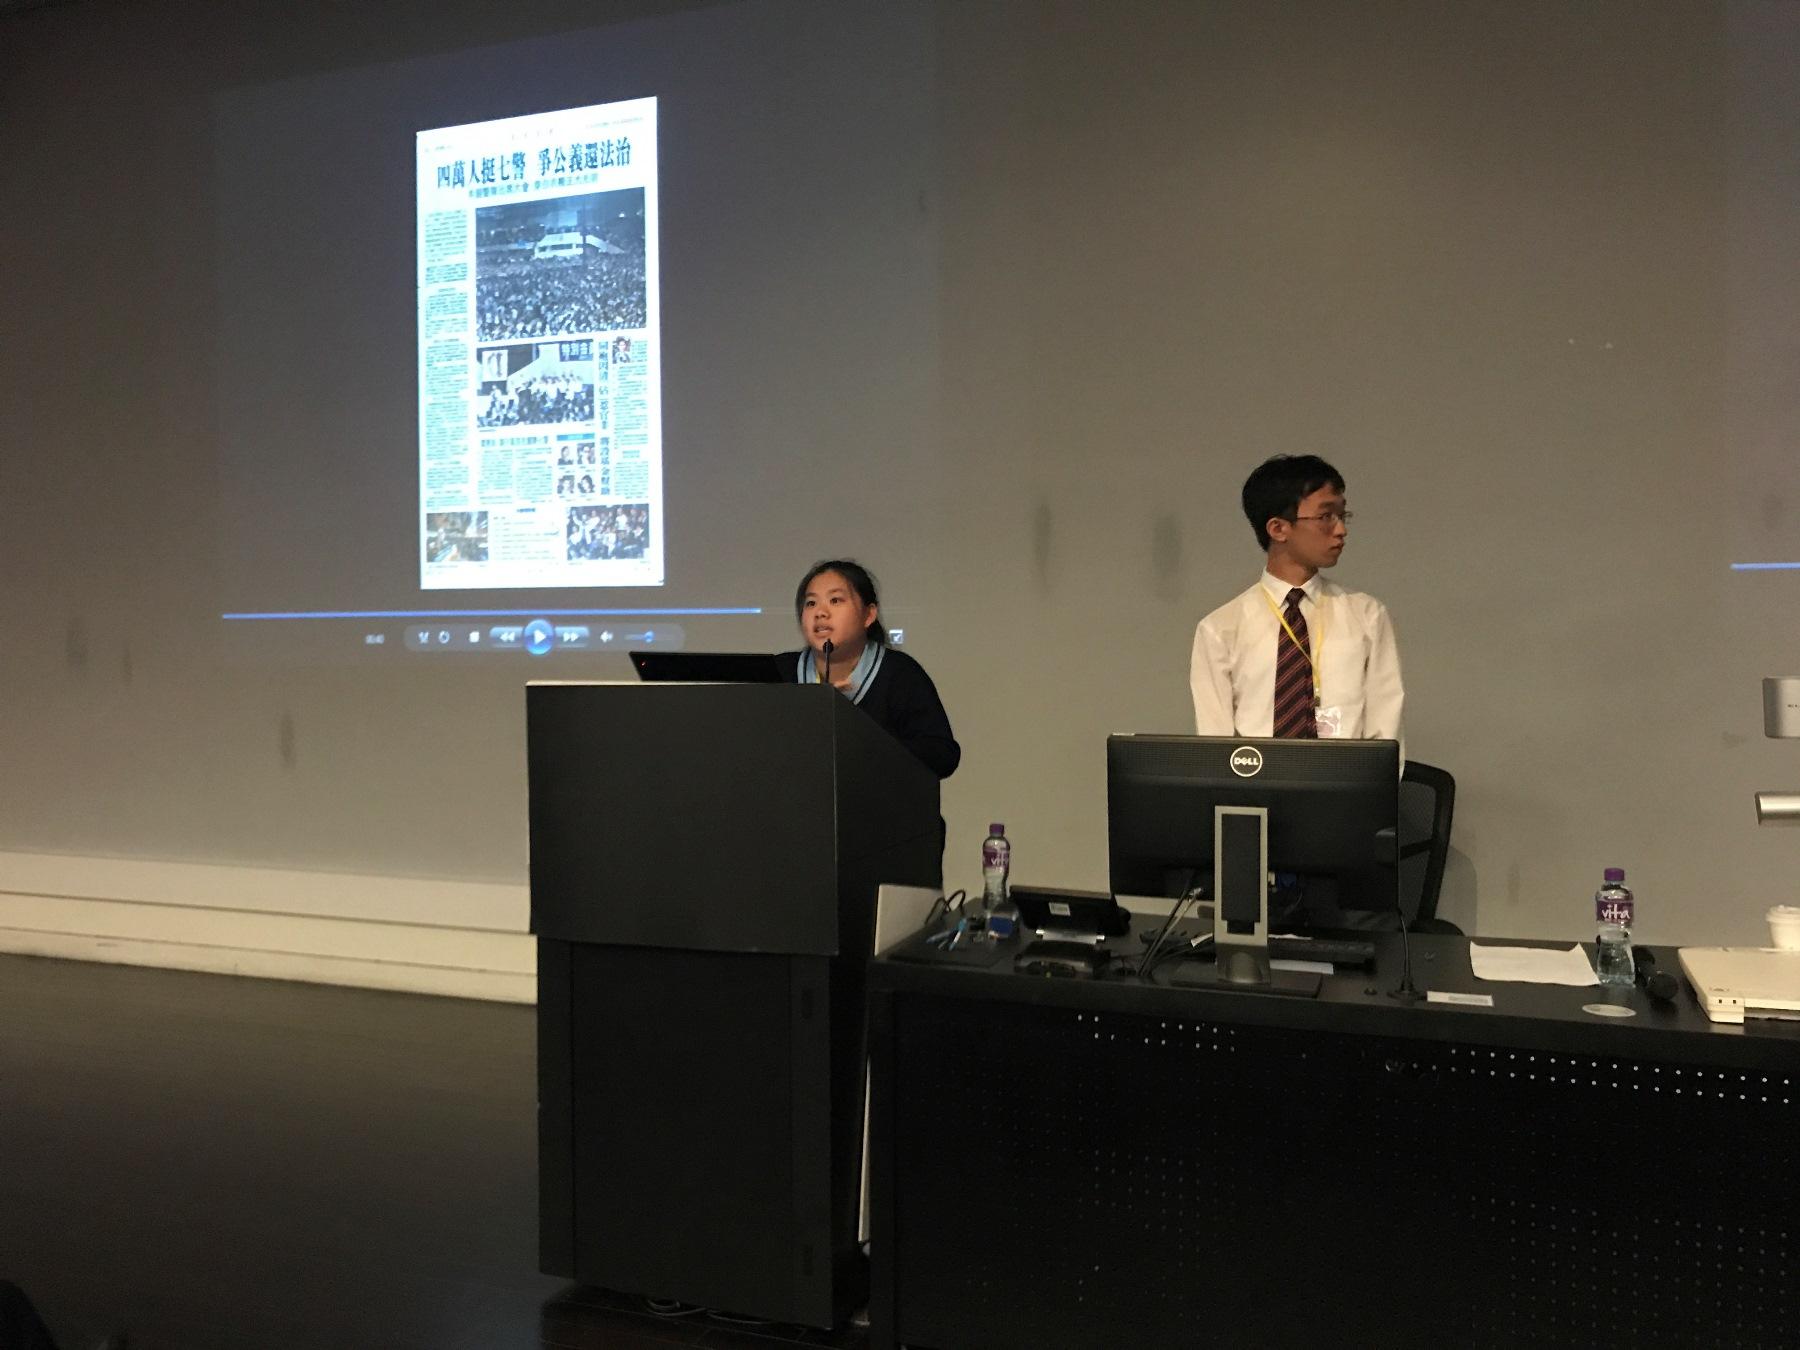 http://www.npc.edu.hk/sites/default/files/img_4005.jpg